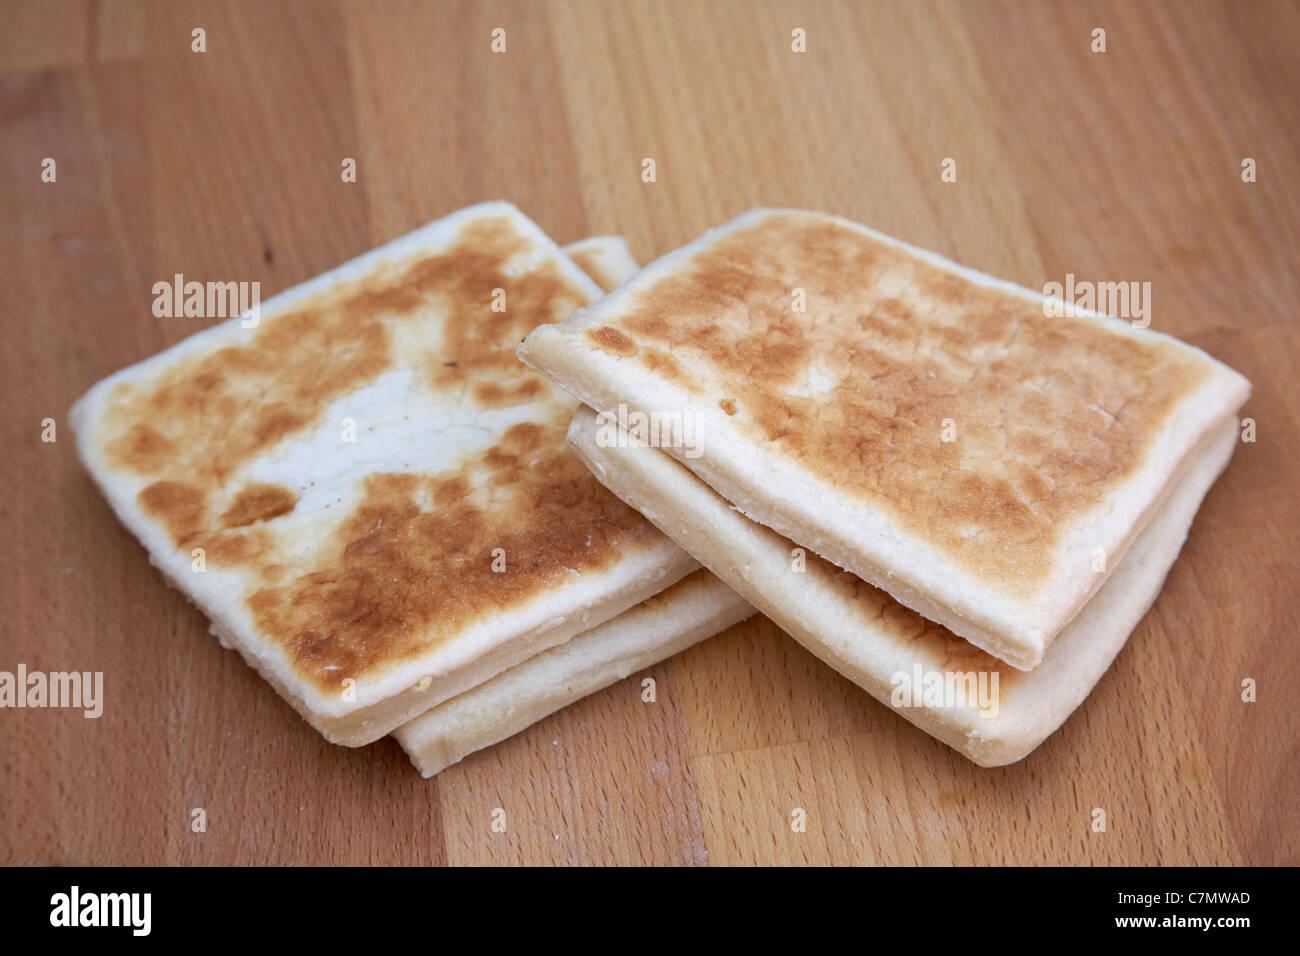 Northern Irish Potato Bread Or Potato Farls Stock Photo 39182261